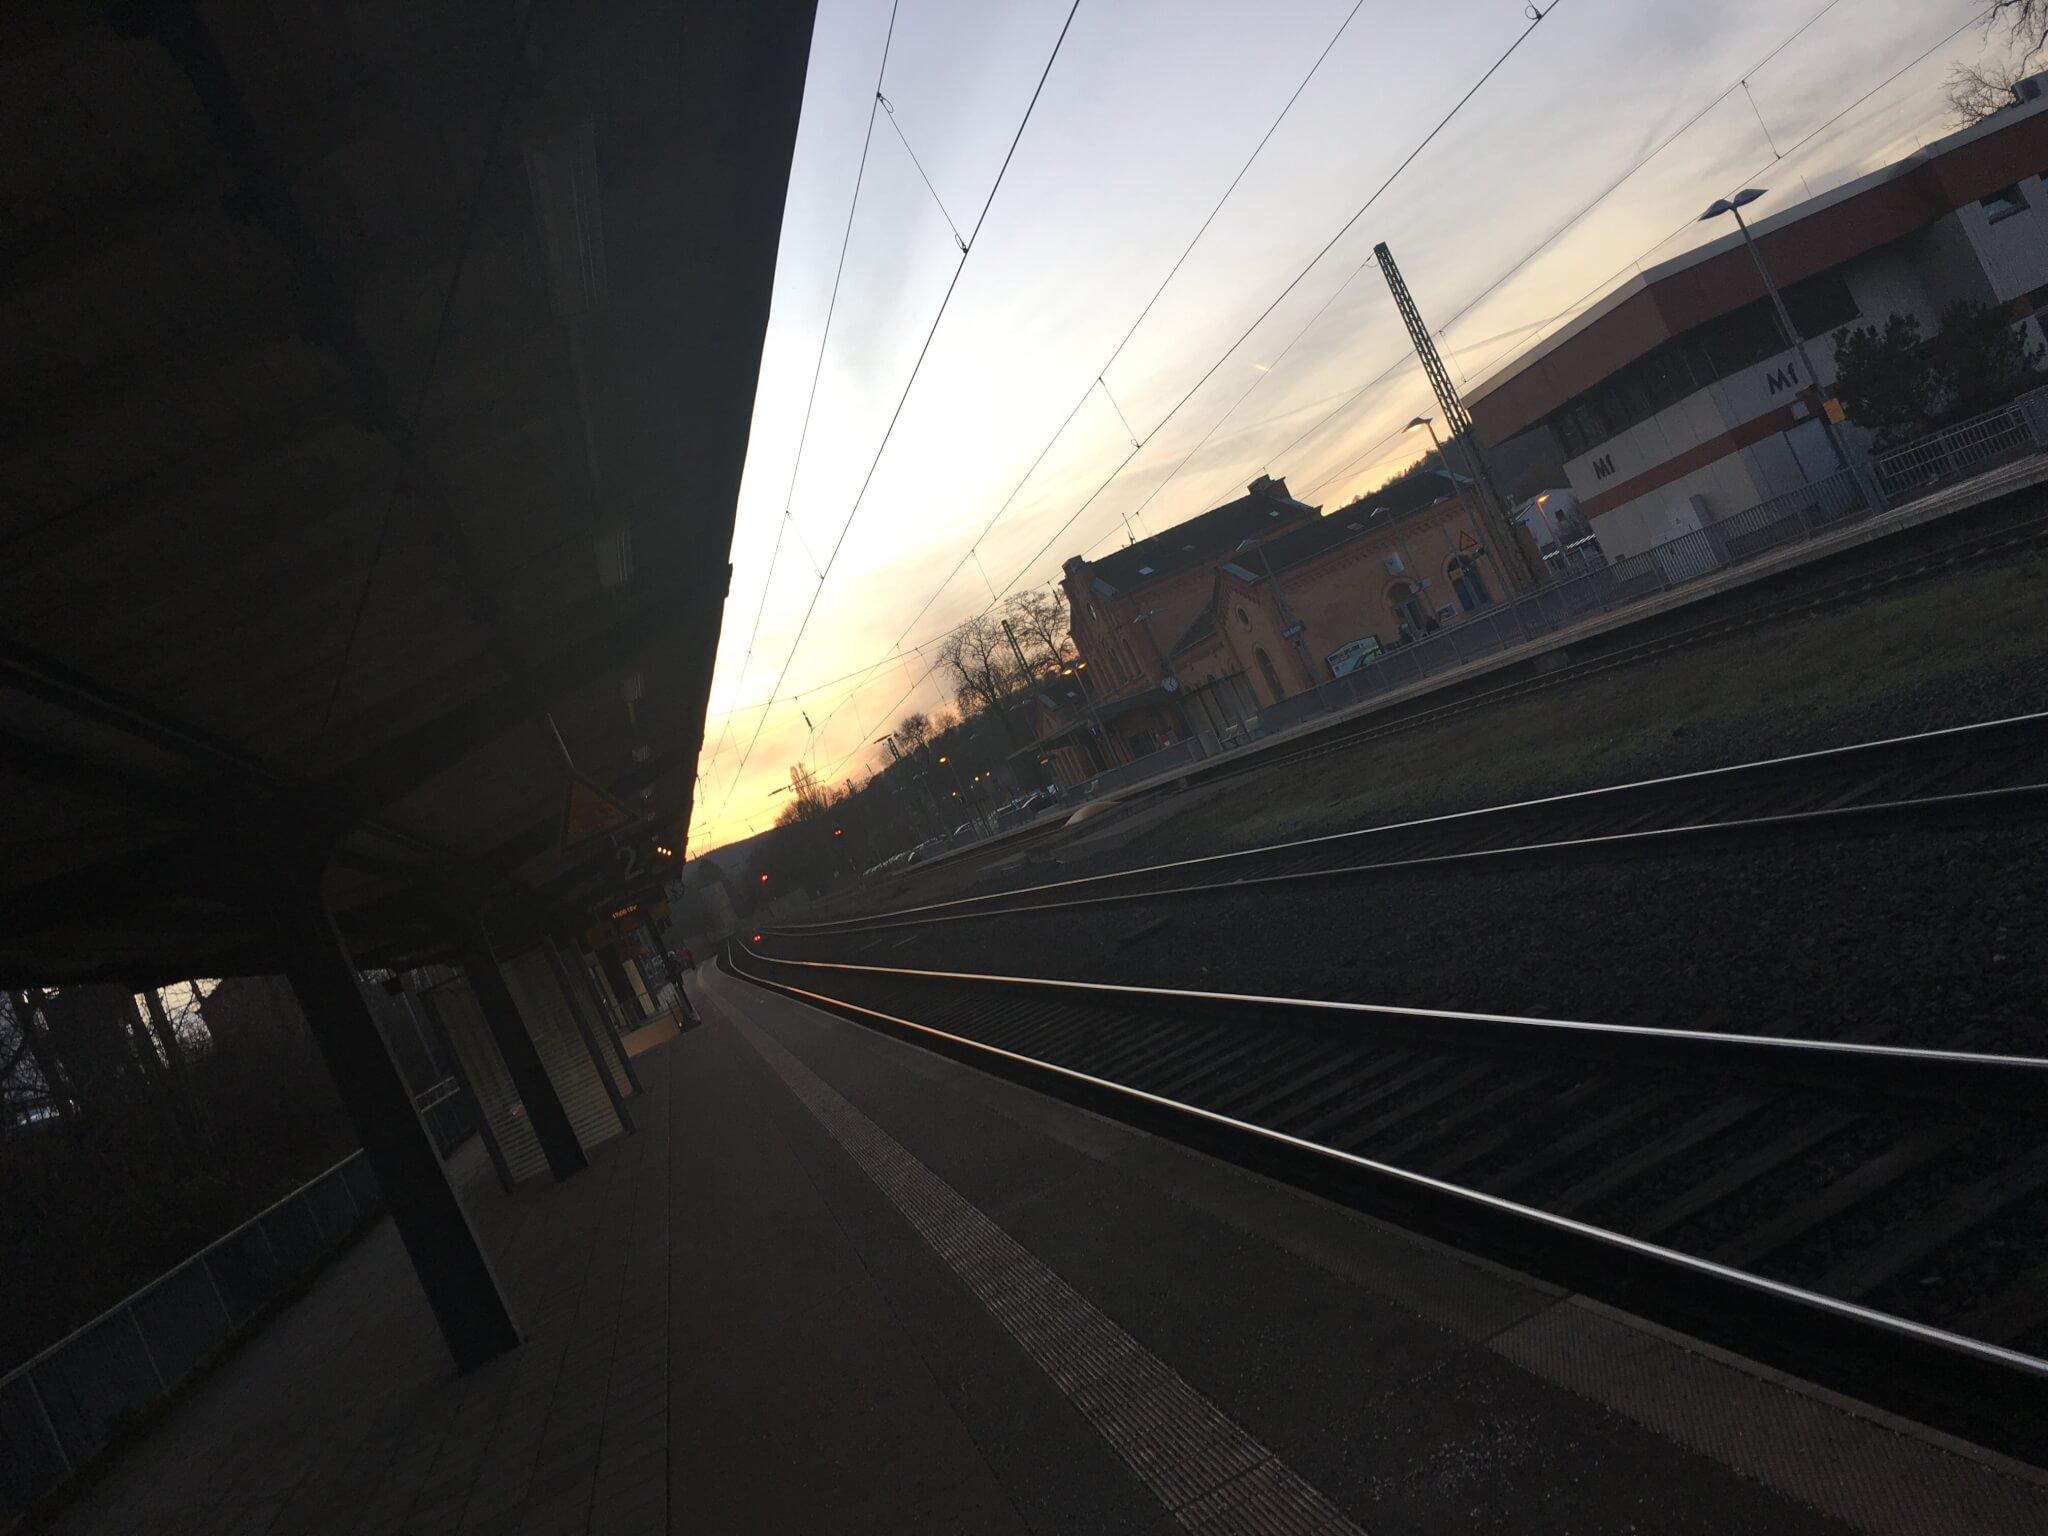 Railway station, Hann. Münden